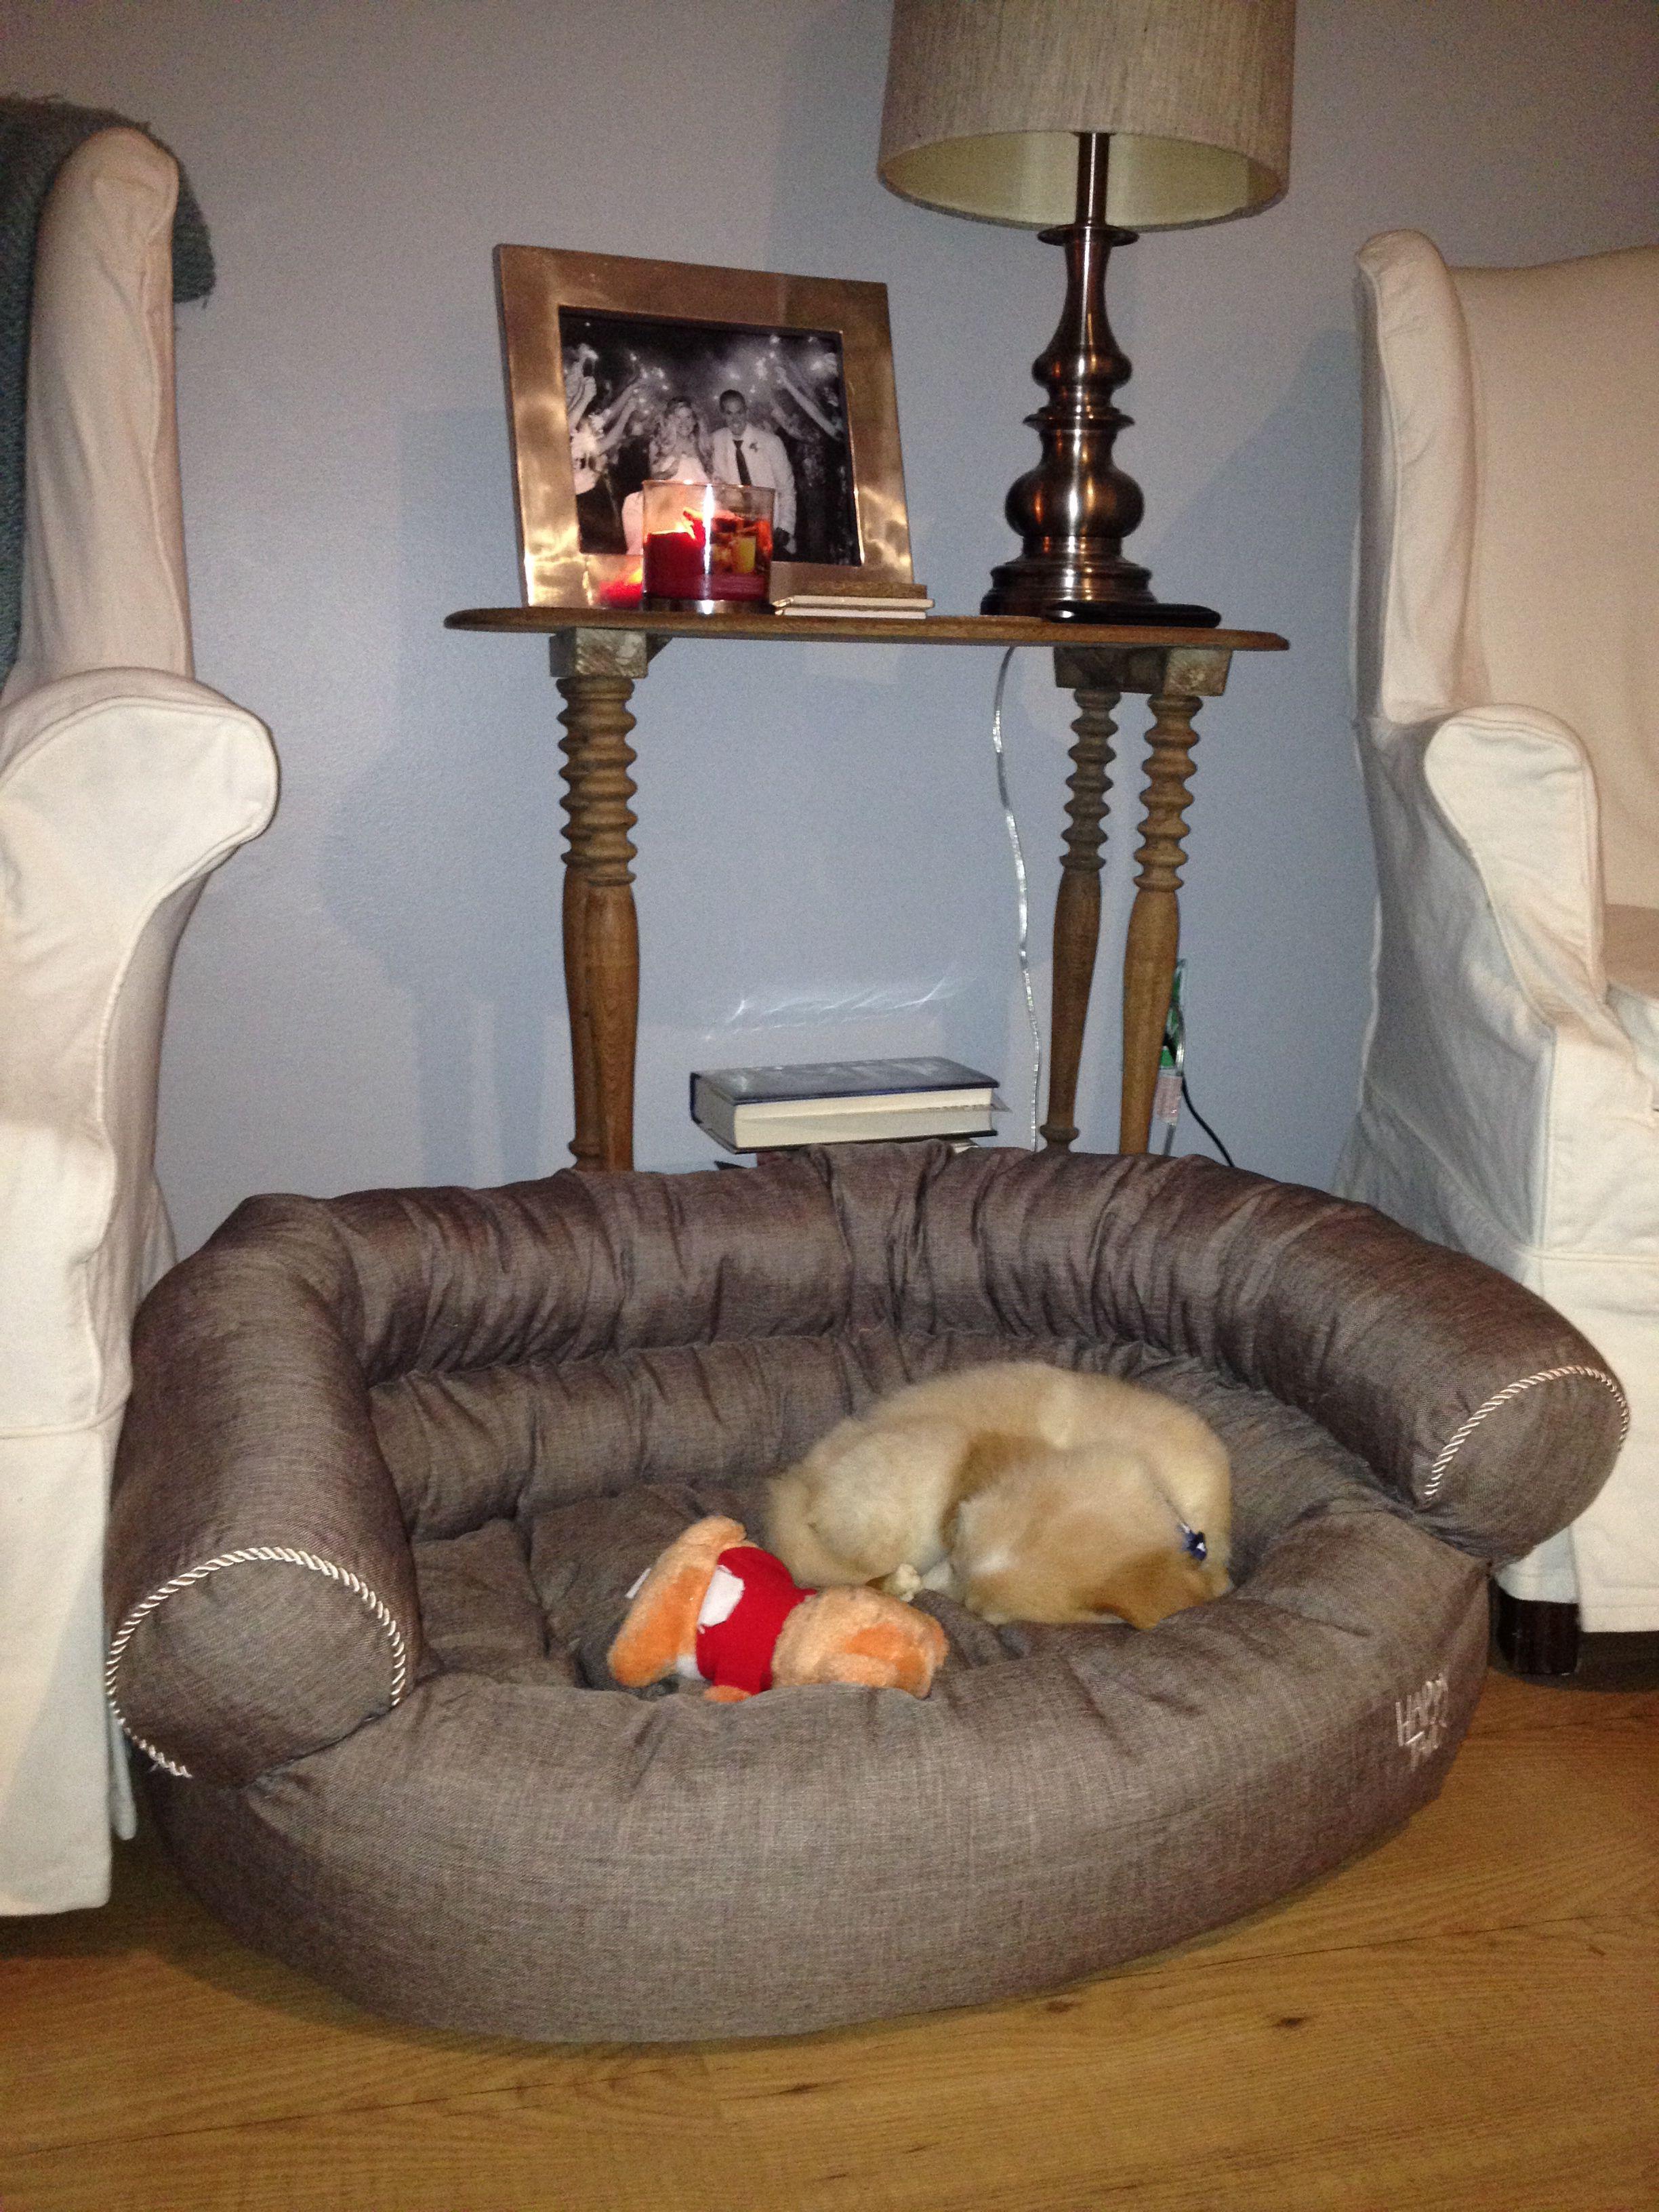 Home Goods dog bed. D'Zine Cool dog beds, Dog bed, Dogs